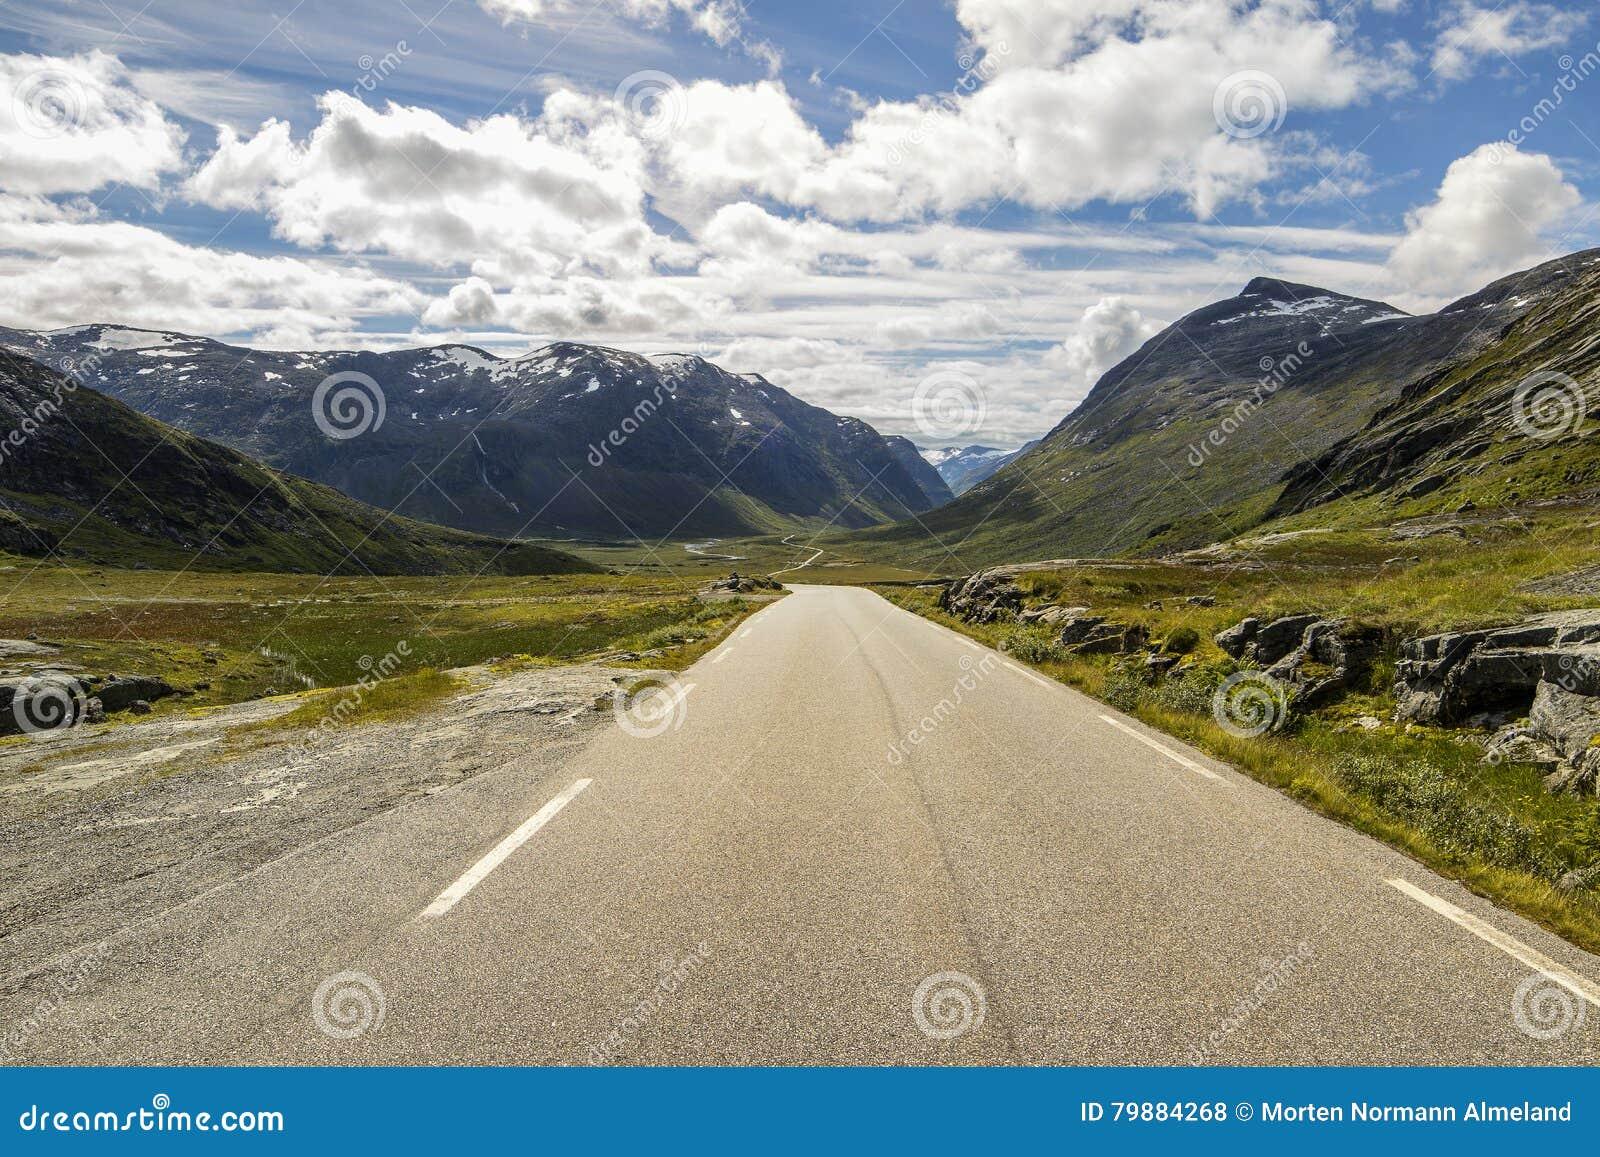 Norway. Scandinavia. Travel. Trollstigen road.